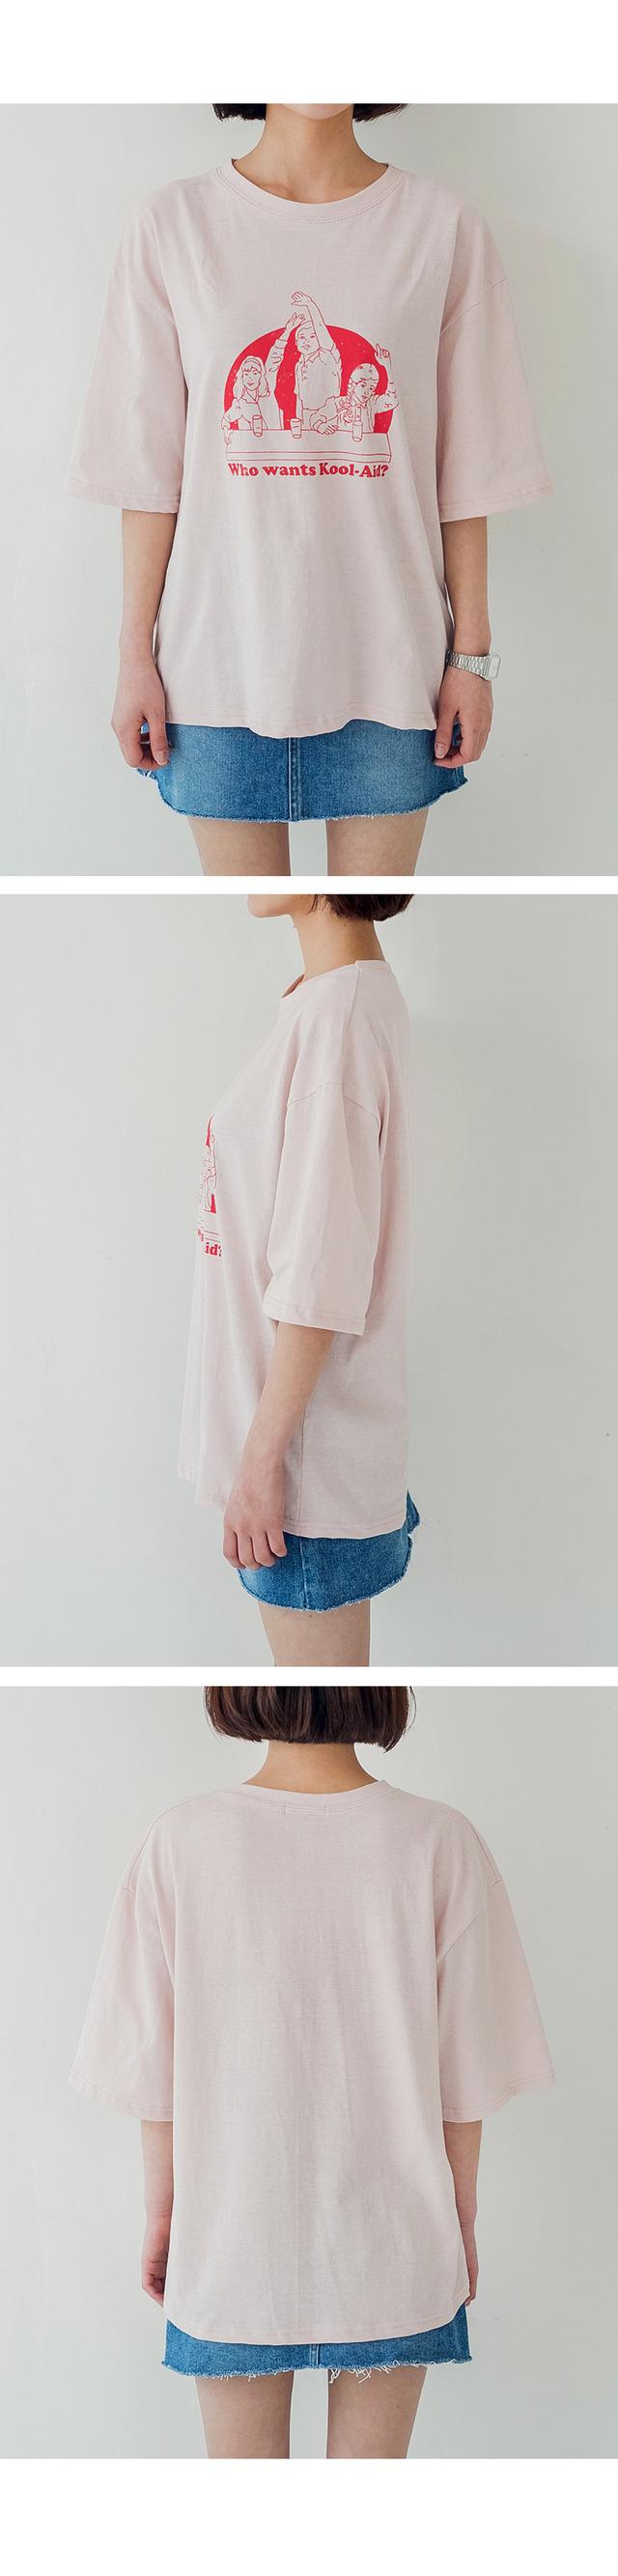 Aide Round Polo Shirt